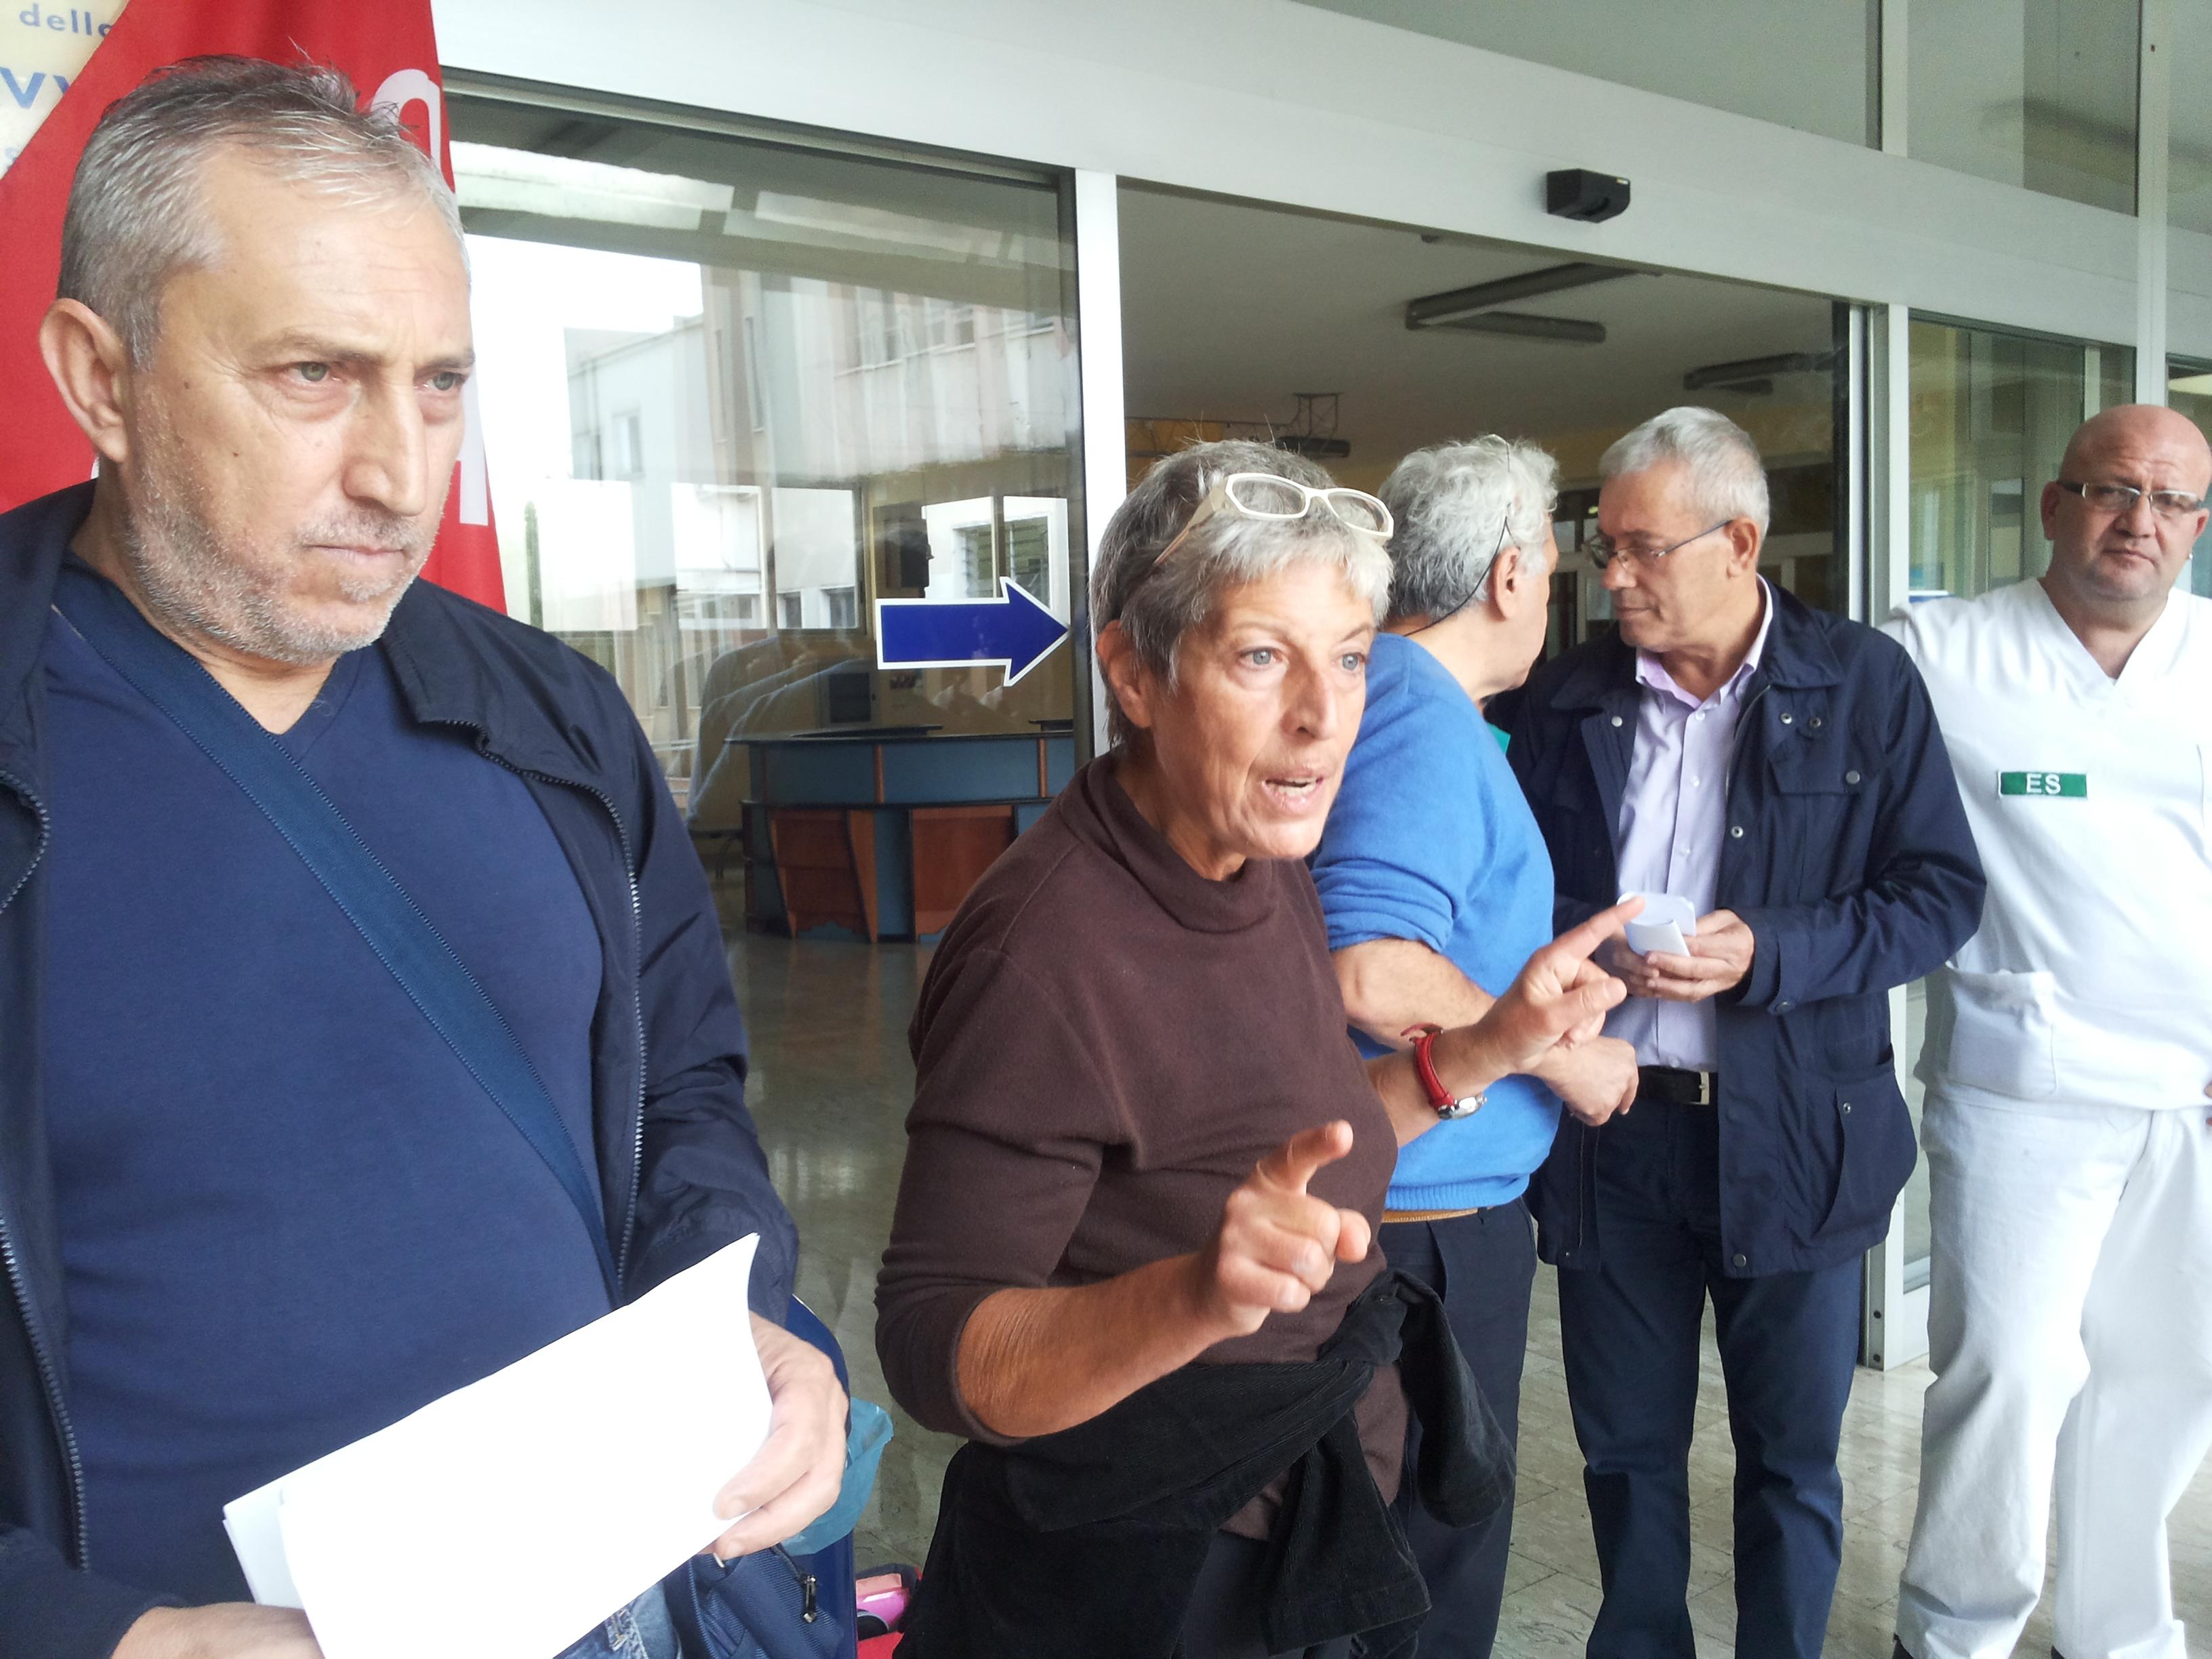 CGIL-FP-Fulgione-Cittadino-Musumeci-Campagna.